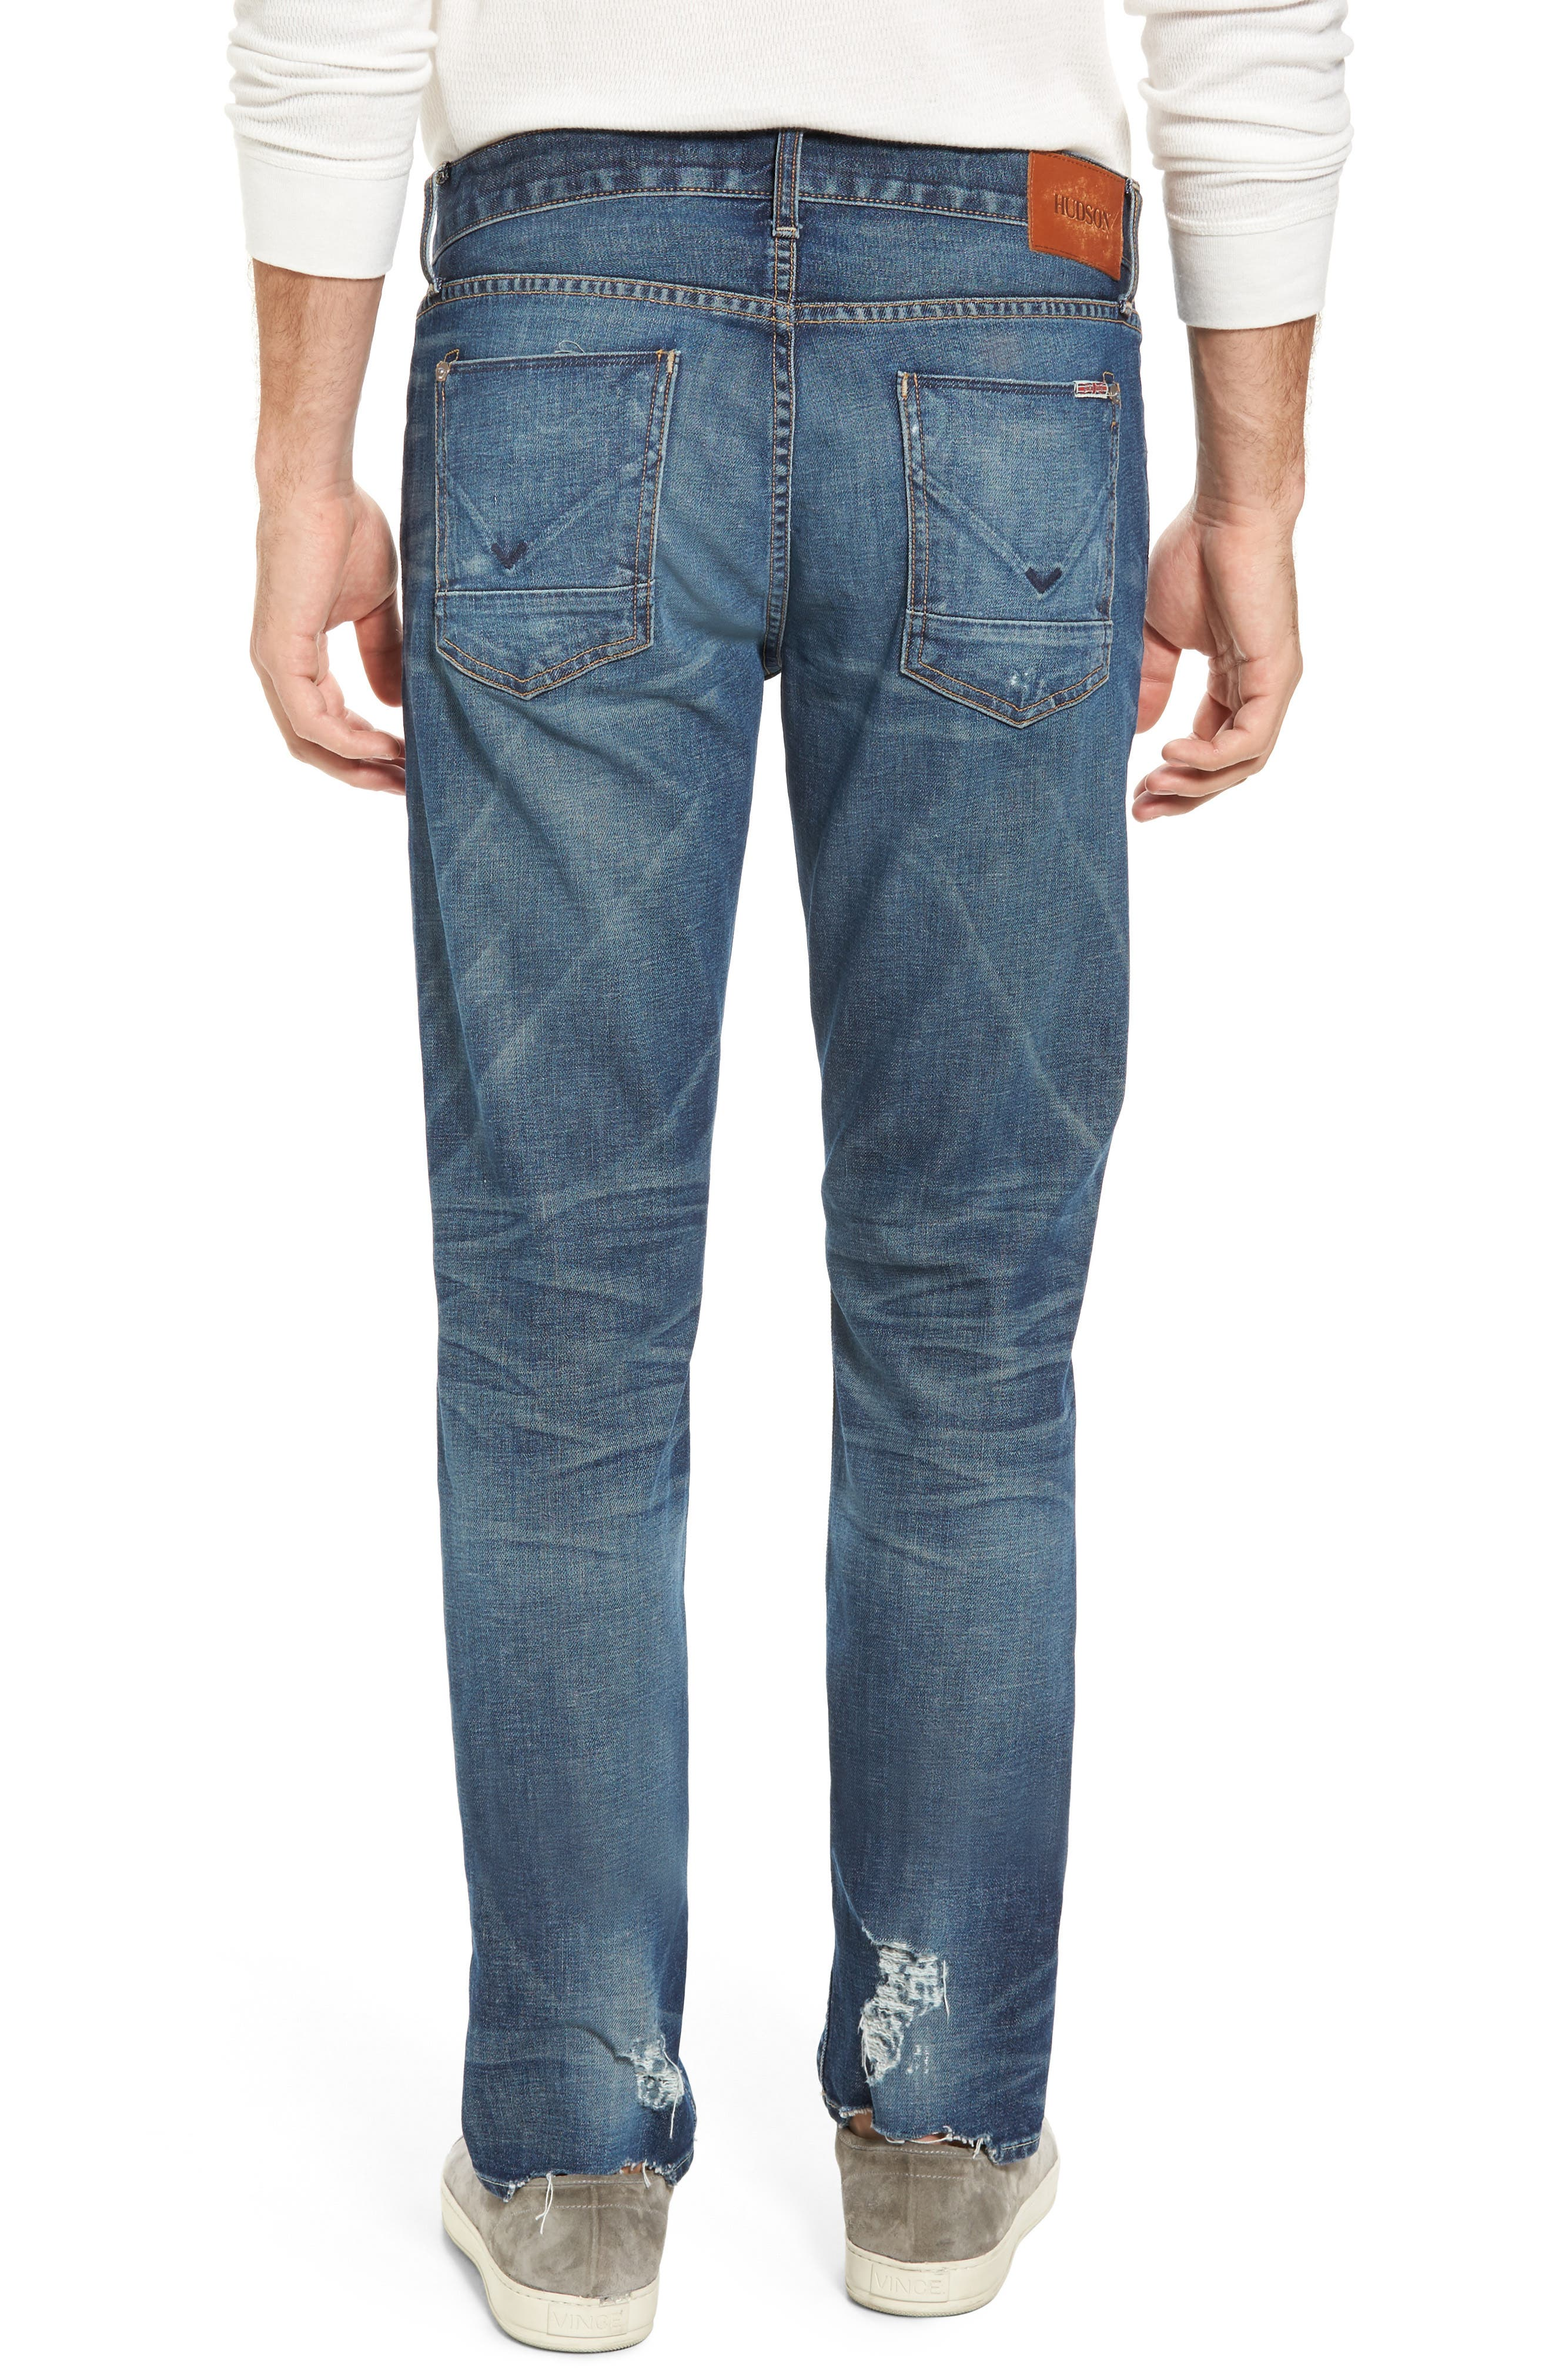 Blake Slim Fit Jeans,                             Alternate thumbnail 2, color,                             425